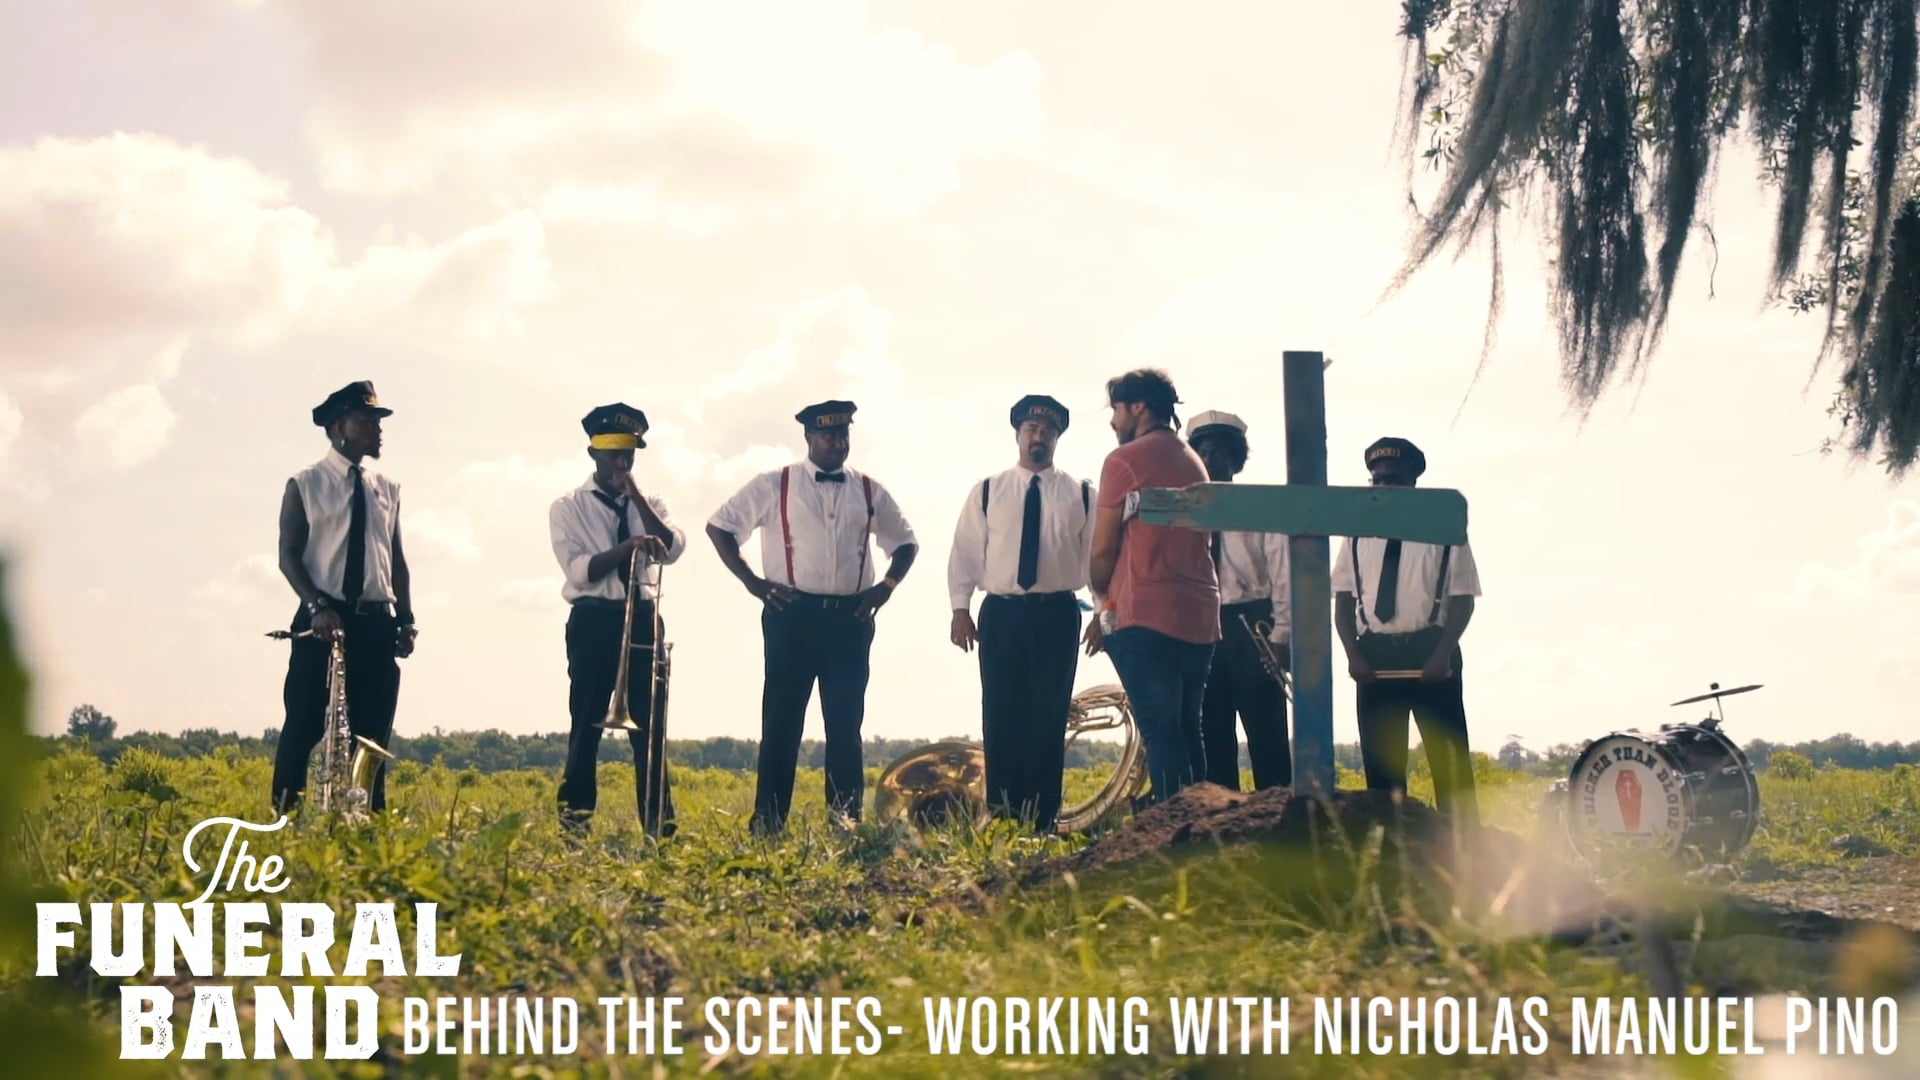 BTS - Working with Nicholas Manuel Pino